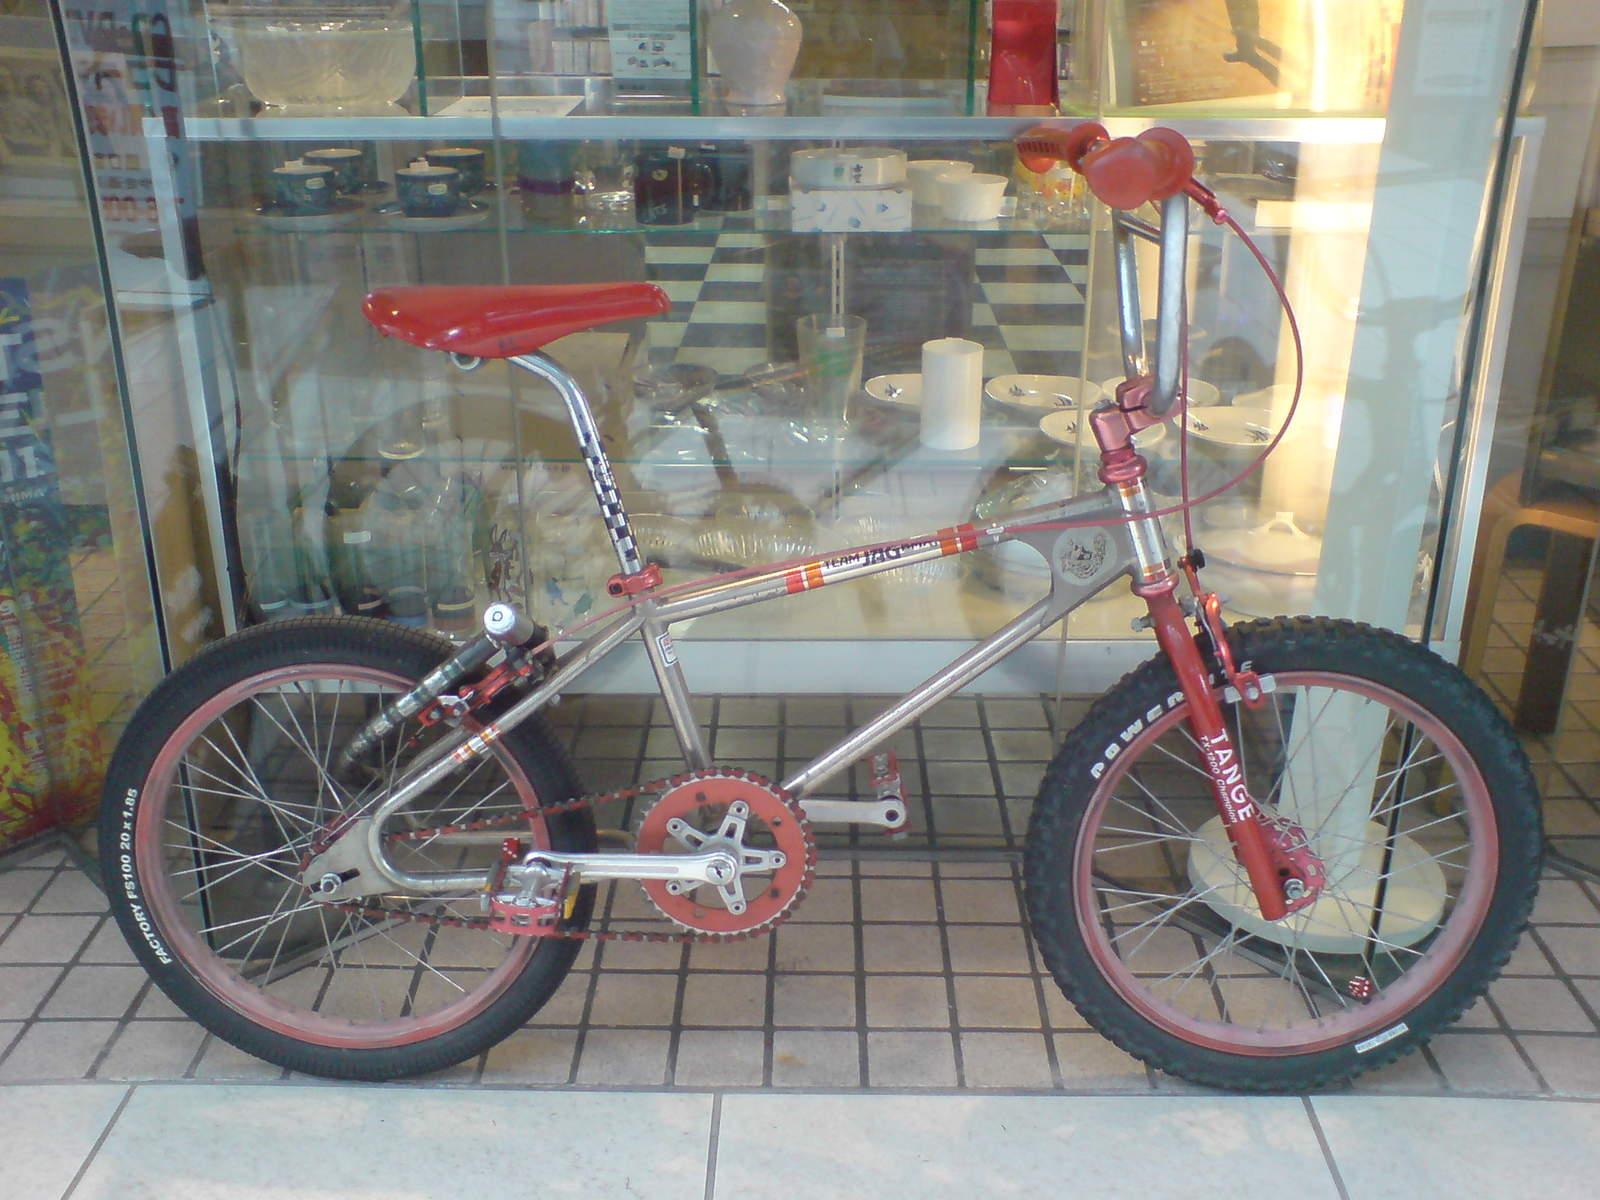 http://uploads.bmxmuseum.com/user-images/47558/fukuoka-jag-015960863f77.jpg